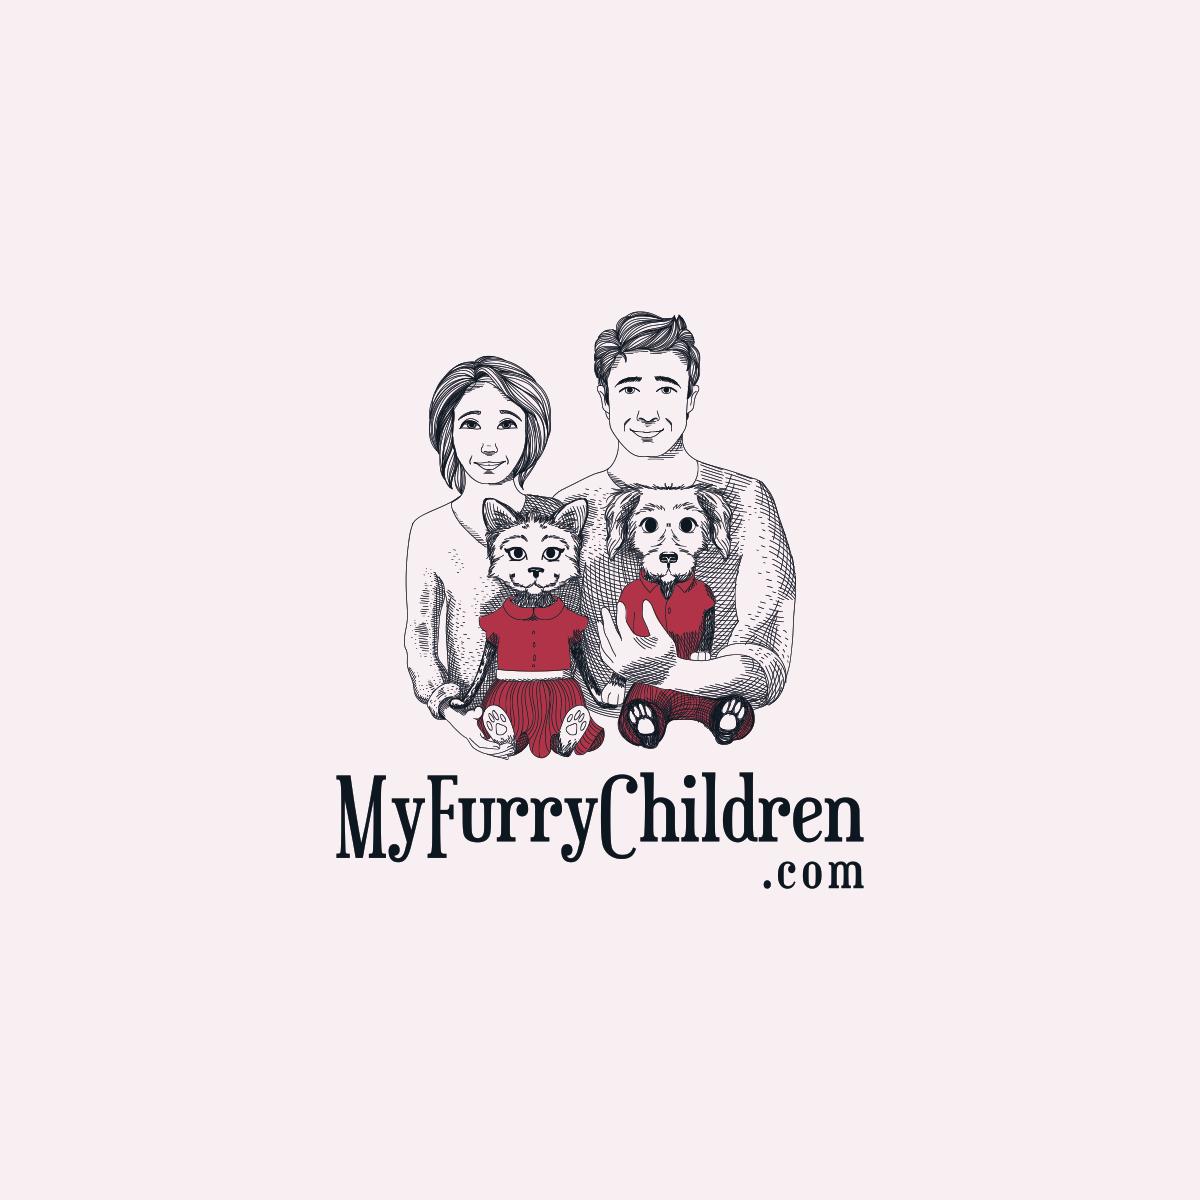 MyFurryChildren.com Logo design